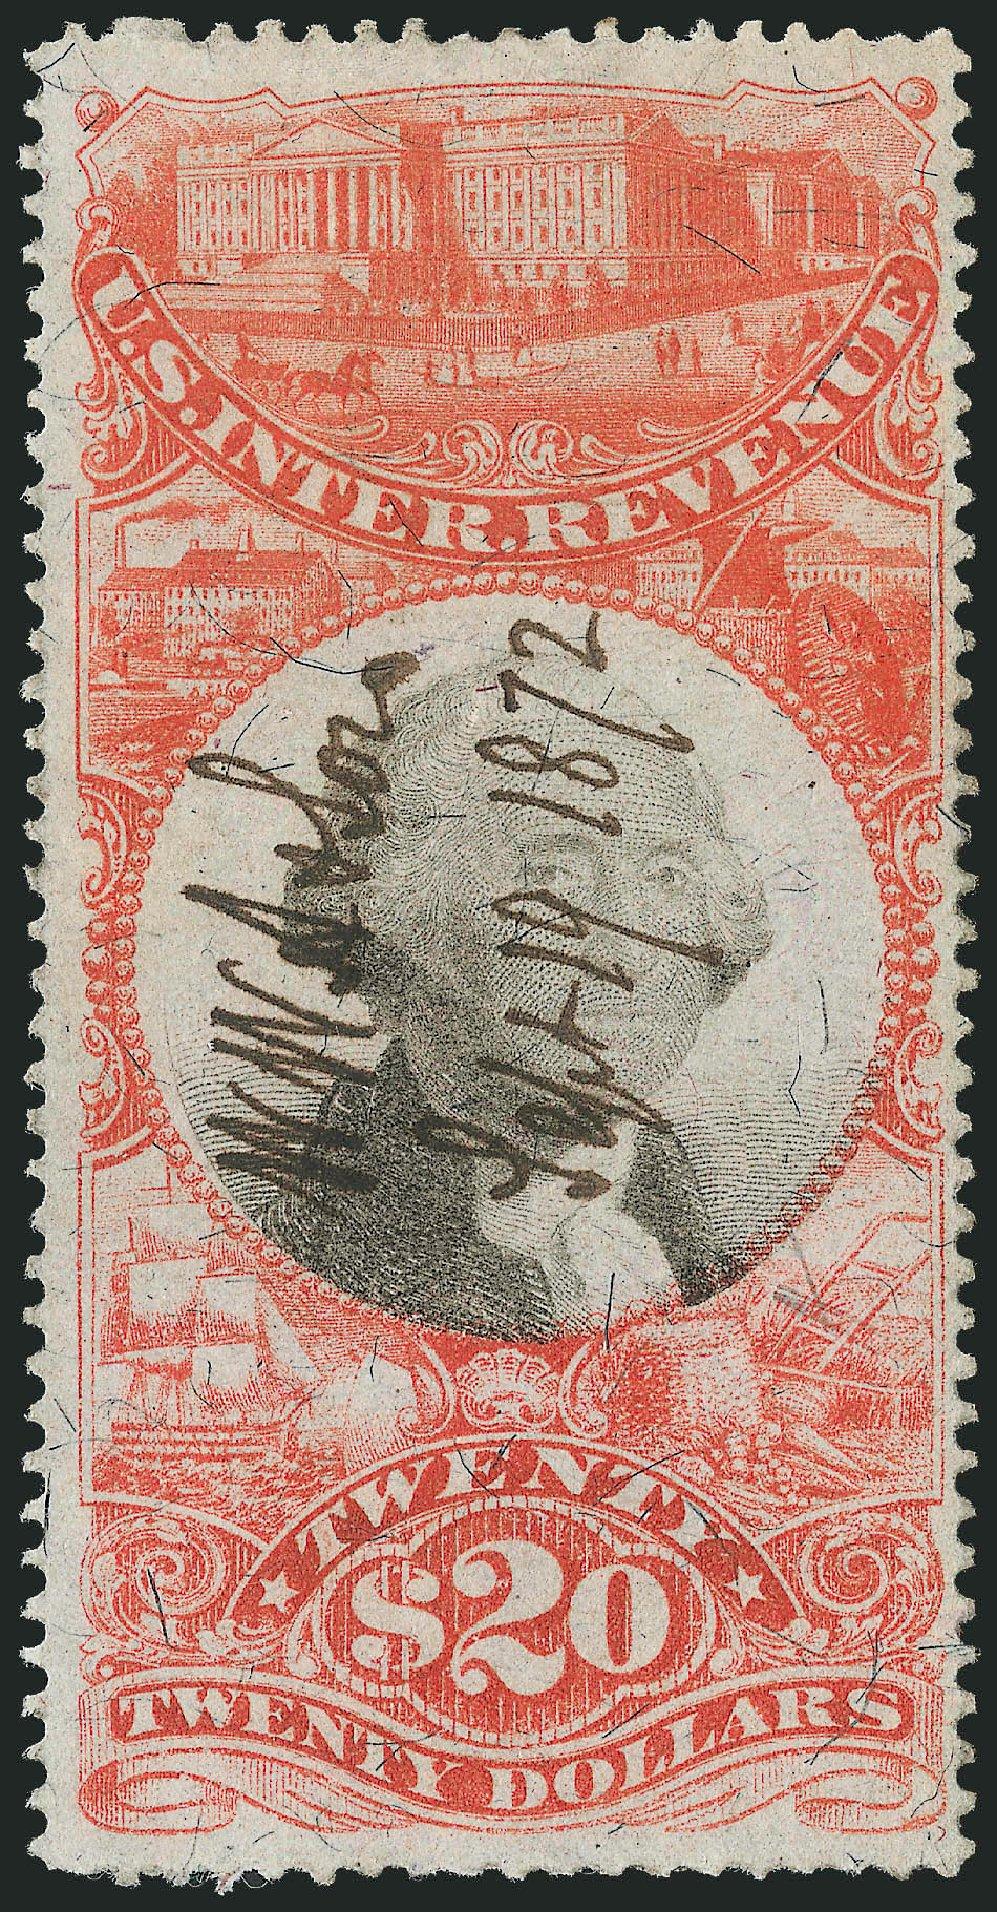 Values of US Stamps Scott Cat. R150 - 1872 US$20.00 Revenue Documentary . Robert Siegel Auction Galleries, Dec 2014, Sale 1089, Lot 521